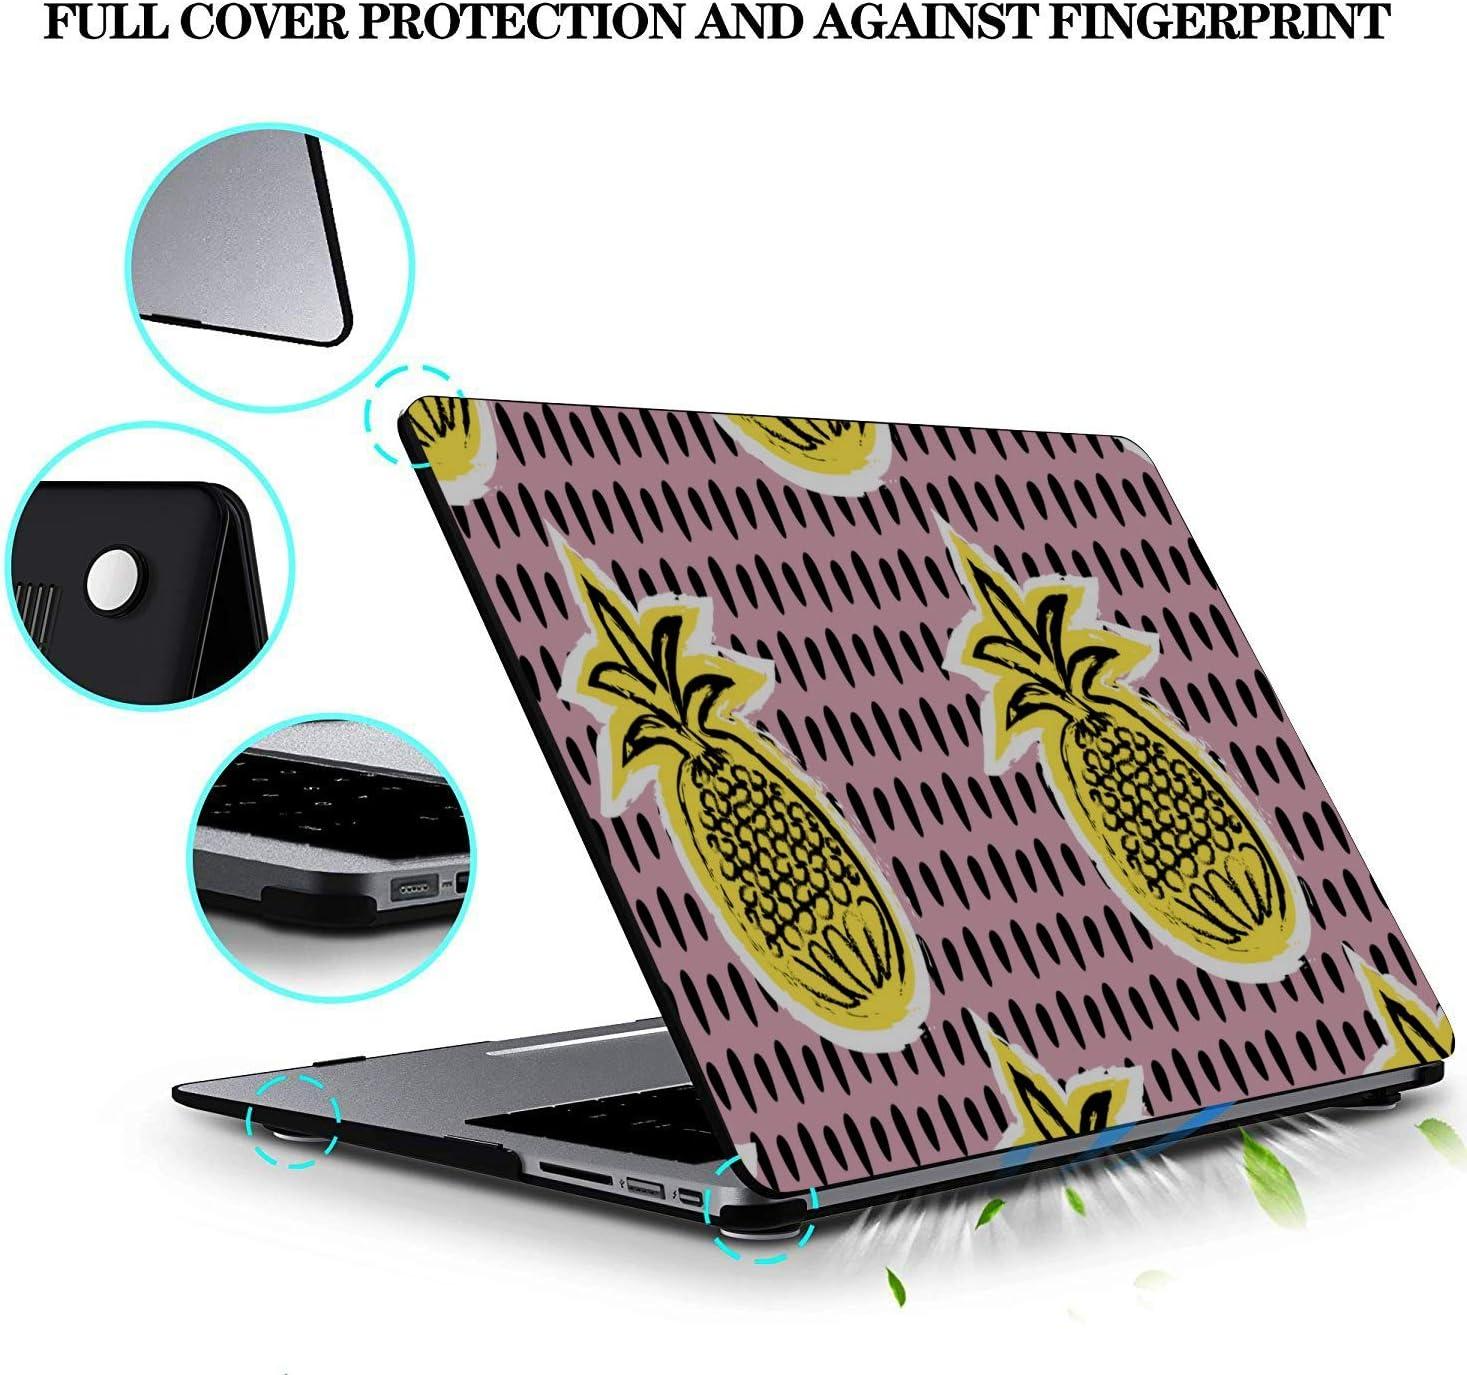 MacBook Air 13in Case Summer Retro Sweet Fruit Pineapple Plastic Hard Shell Compatible Mac Air 11 Pro 13 15 MacBook Air Case 2018 Protection for MacBook 2016-2019 Version